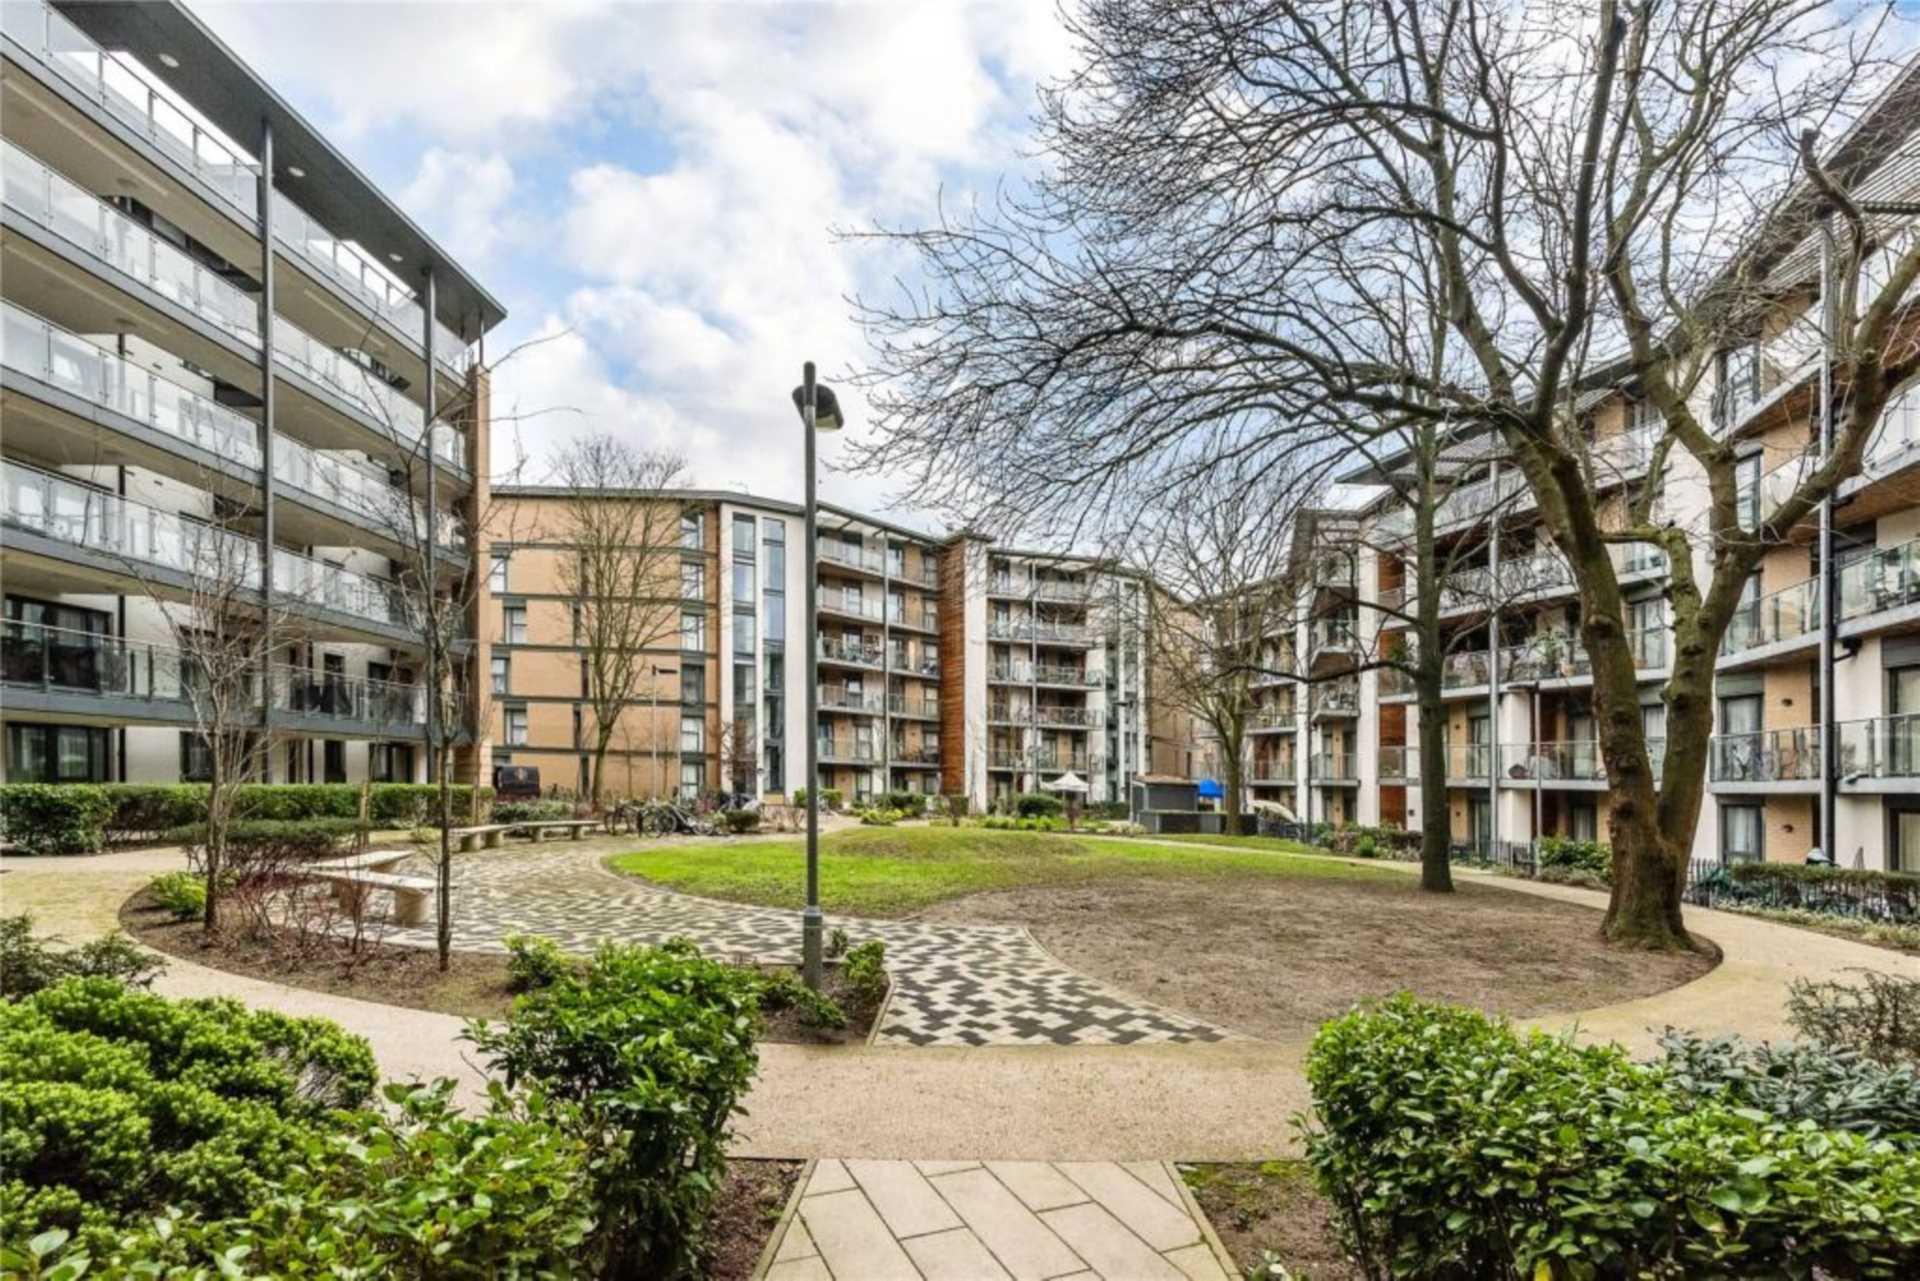 Dragmore Street, Clapham Park, Image 12